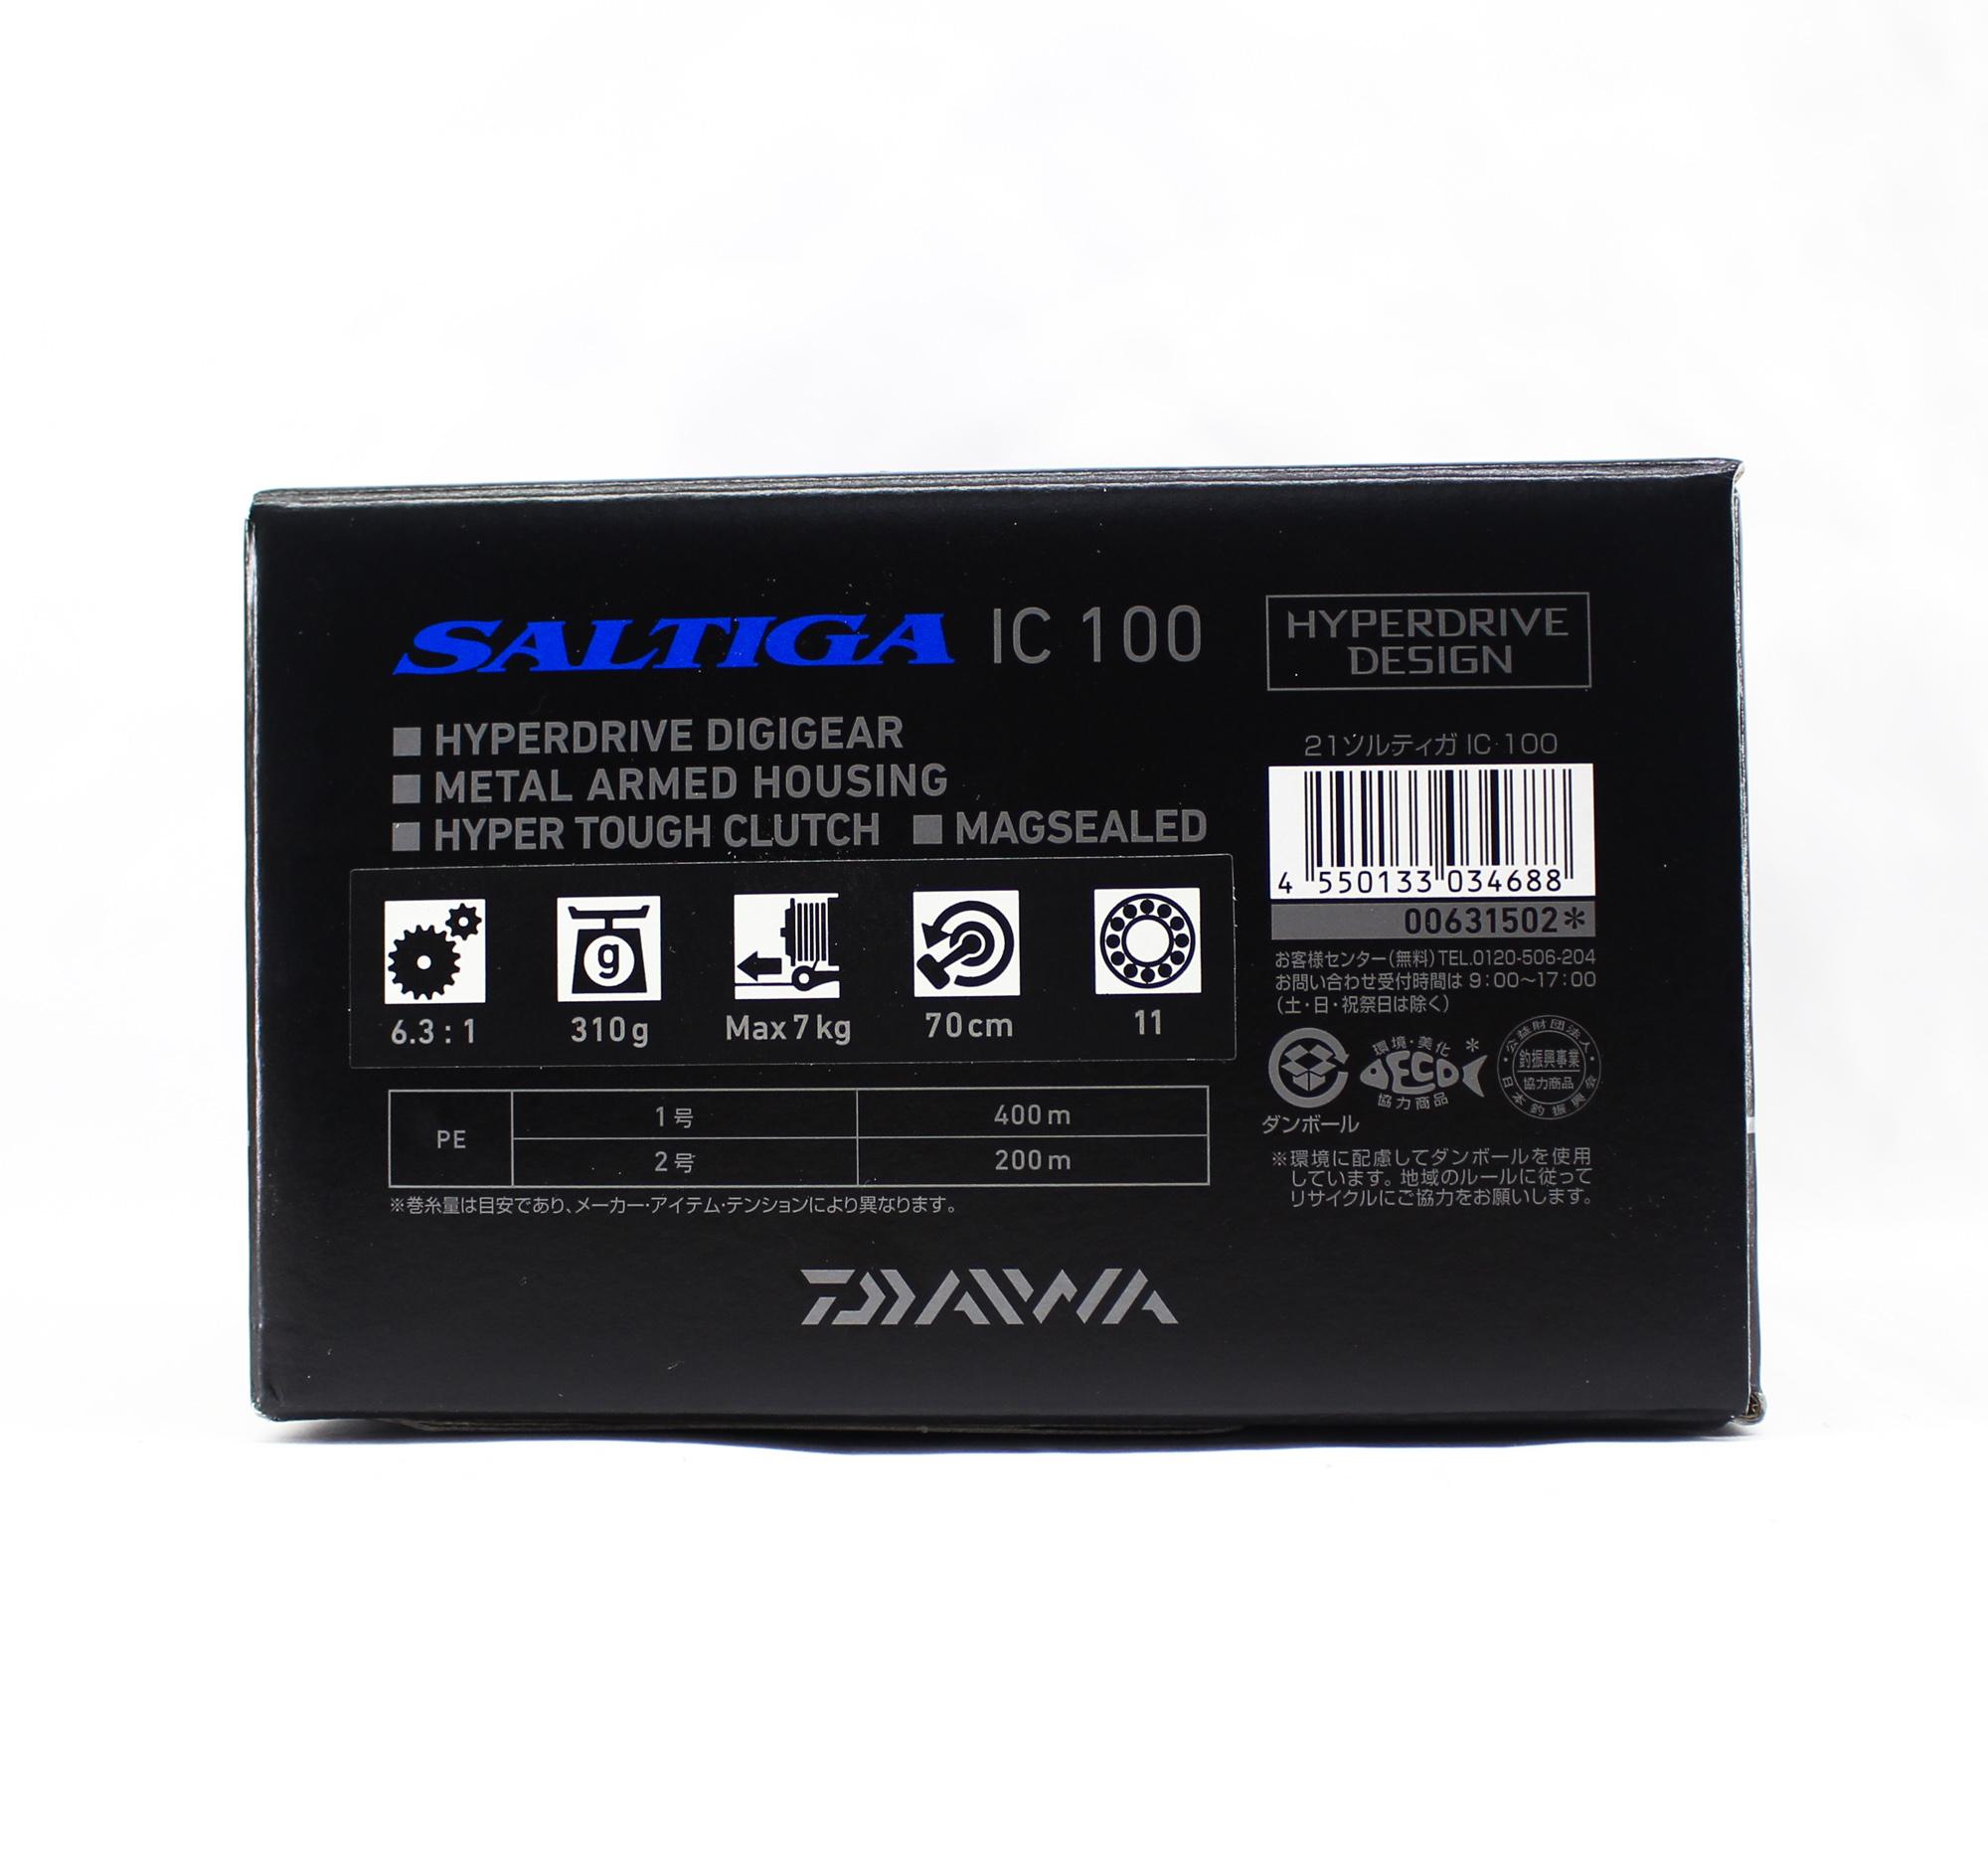 Daiwa Reel Baitcast 21 Saltiga IC 100 Right Hand (4688)